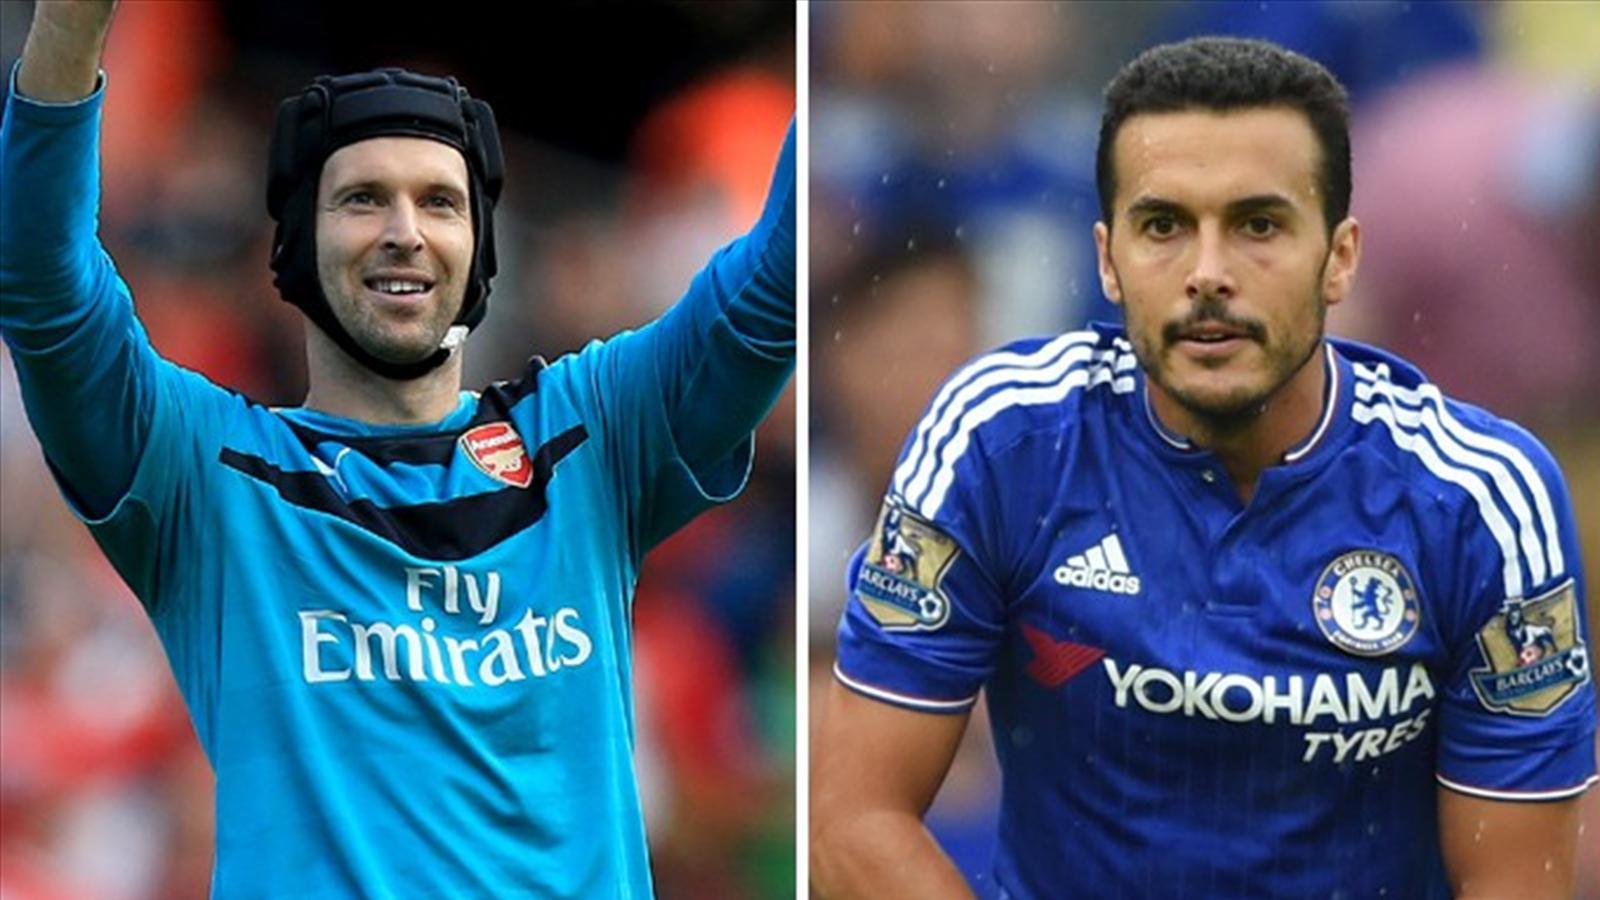 Premier League summer signings Petr Cech, Pedro and Memphis Depay